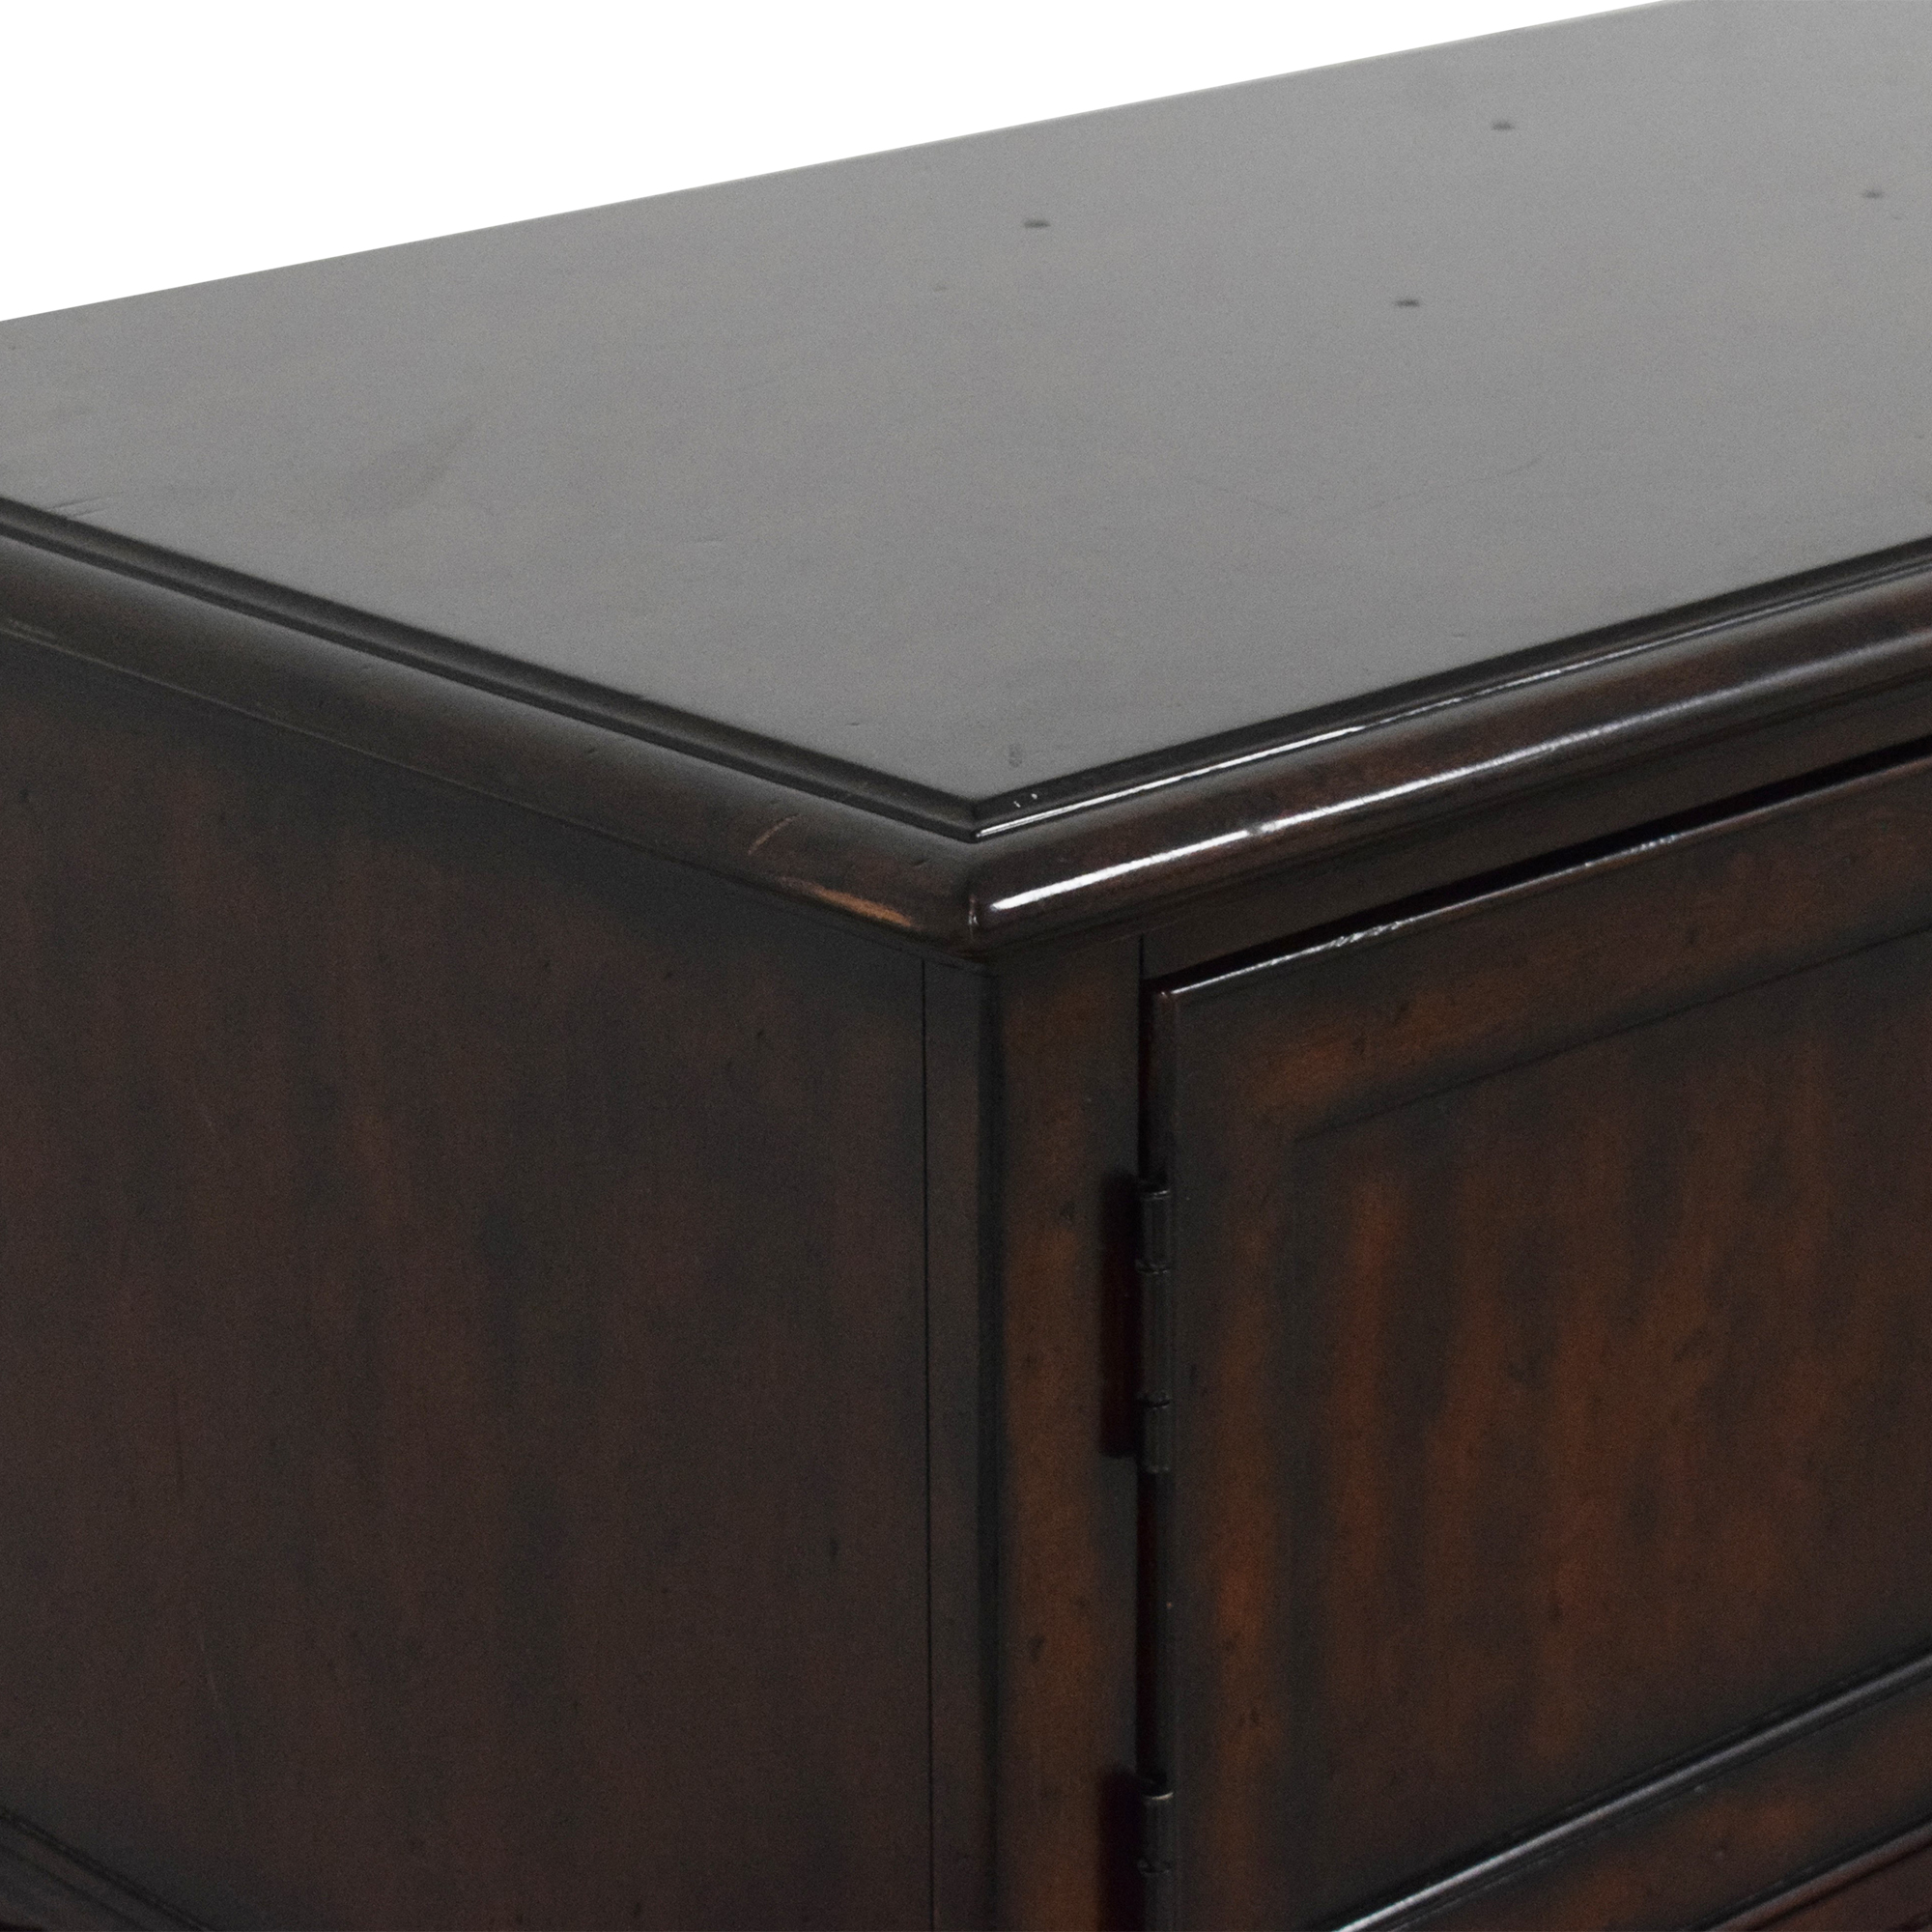 Lexington Furniture Lexington Furniture Buffet Sideboard dark brown